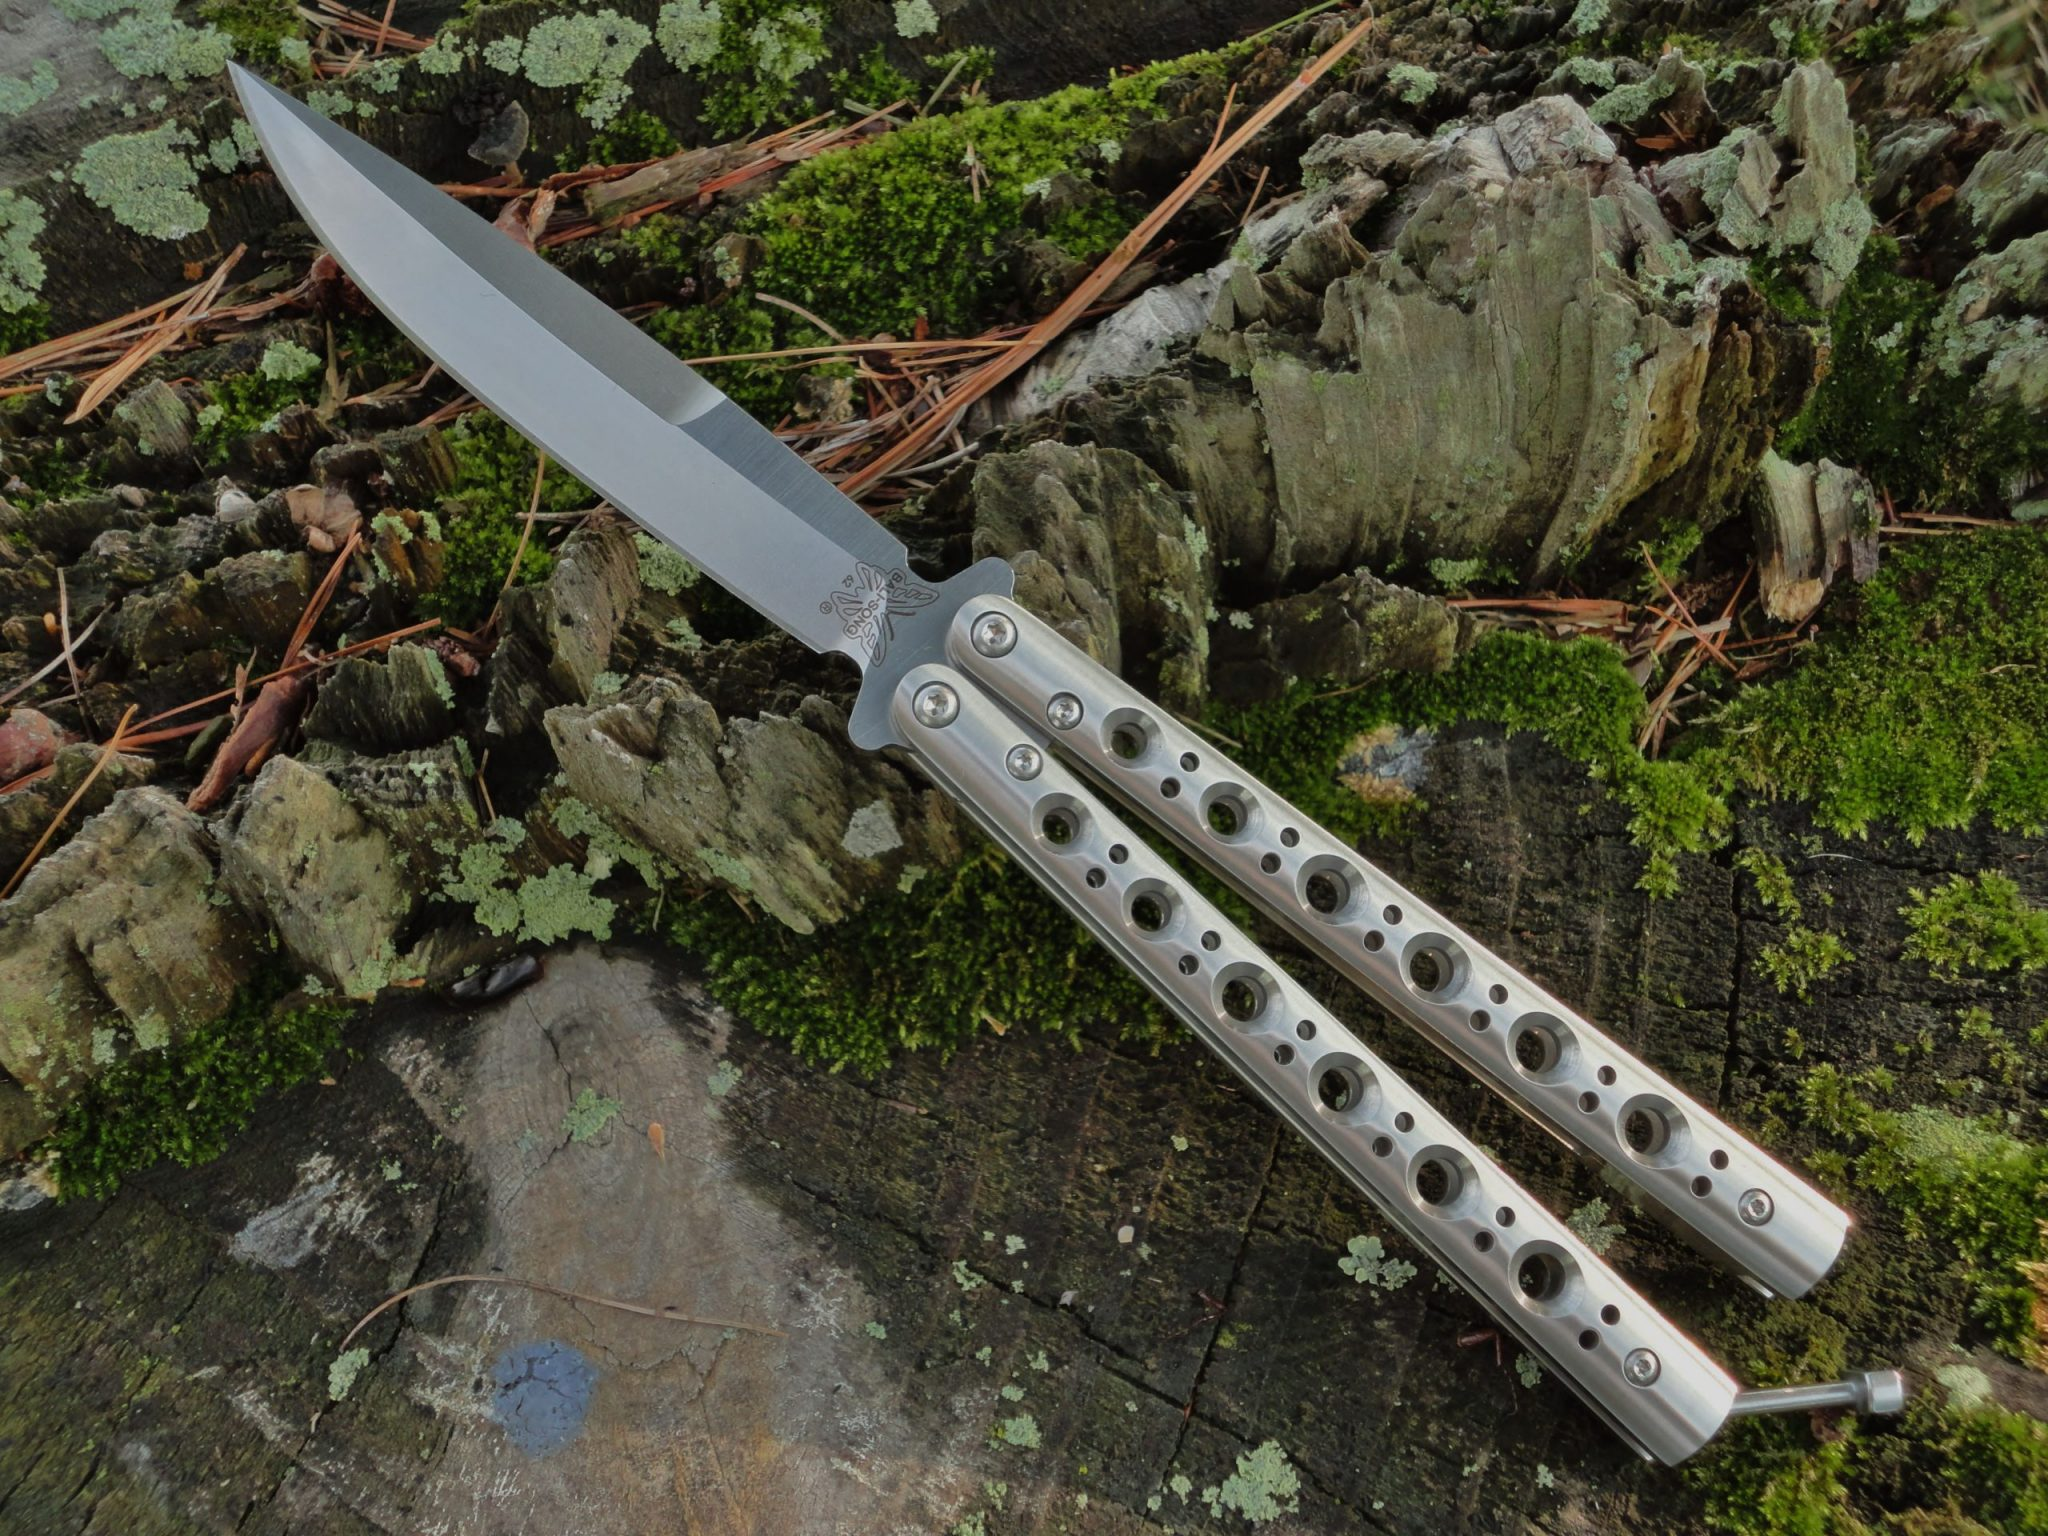 Benchmade 62 Weehawk Blade Balisong